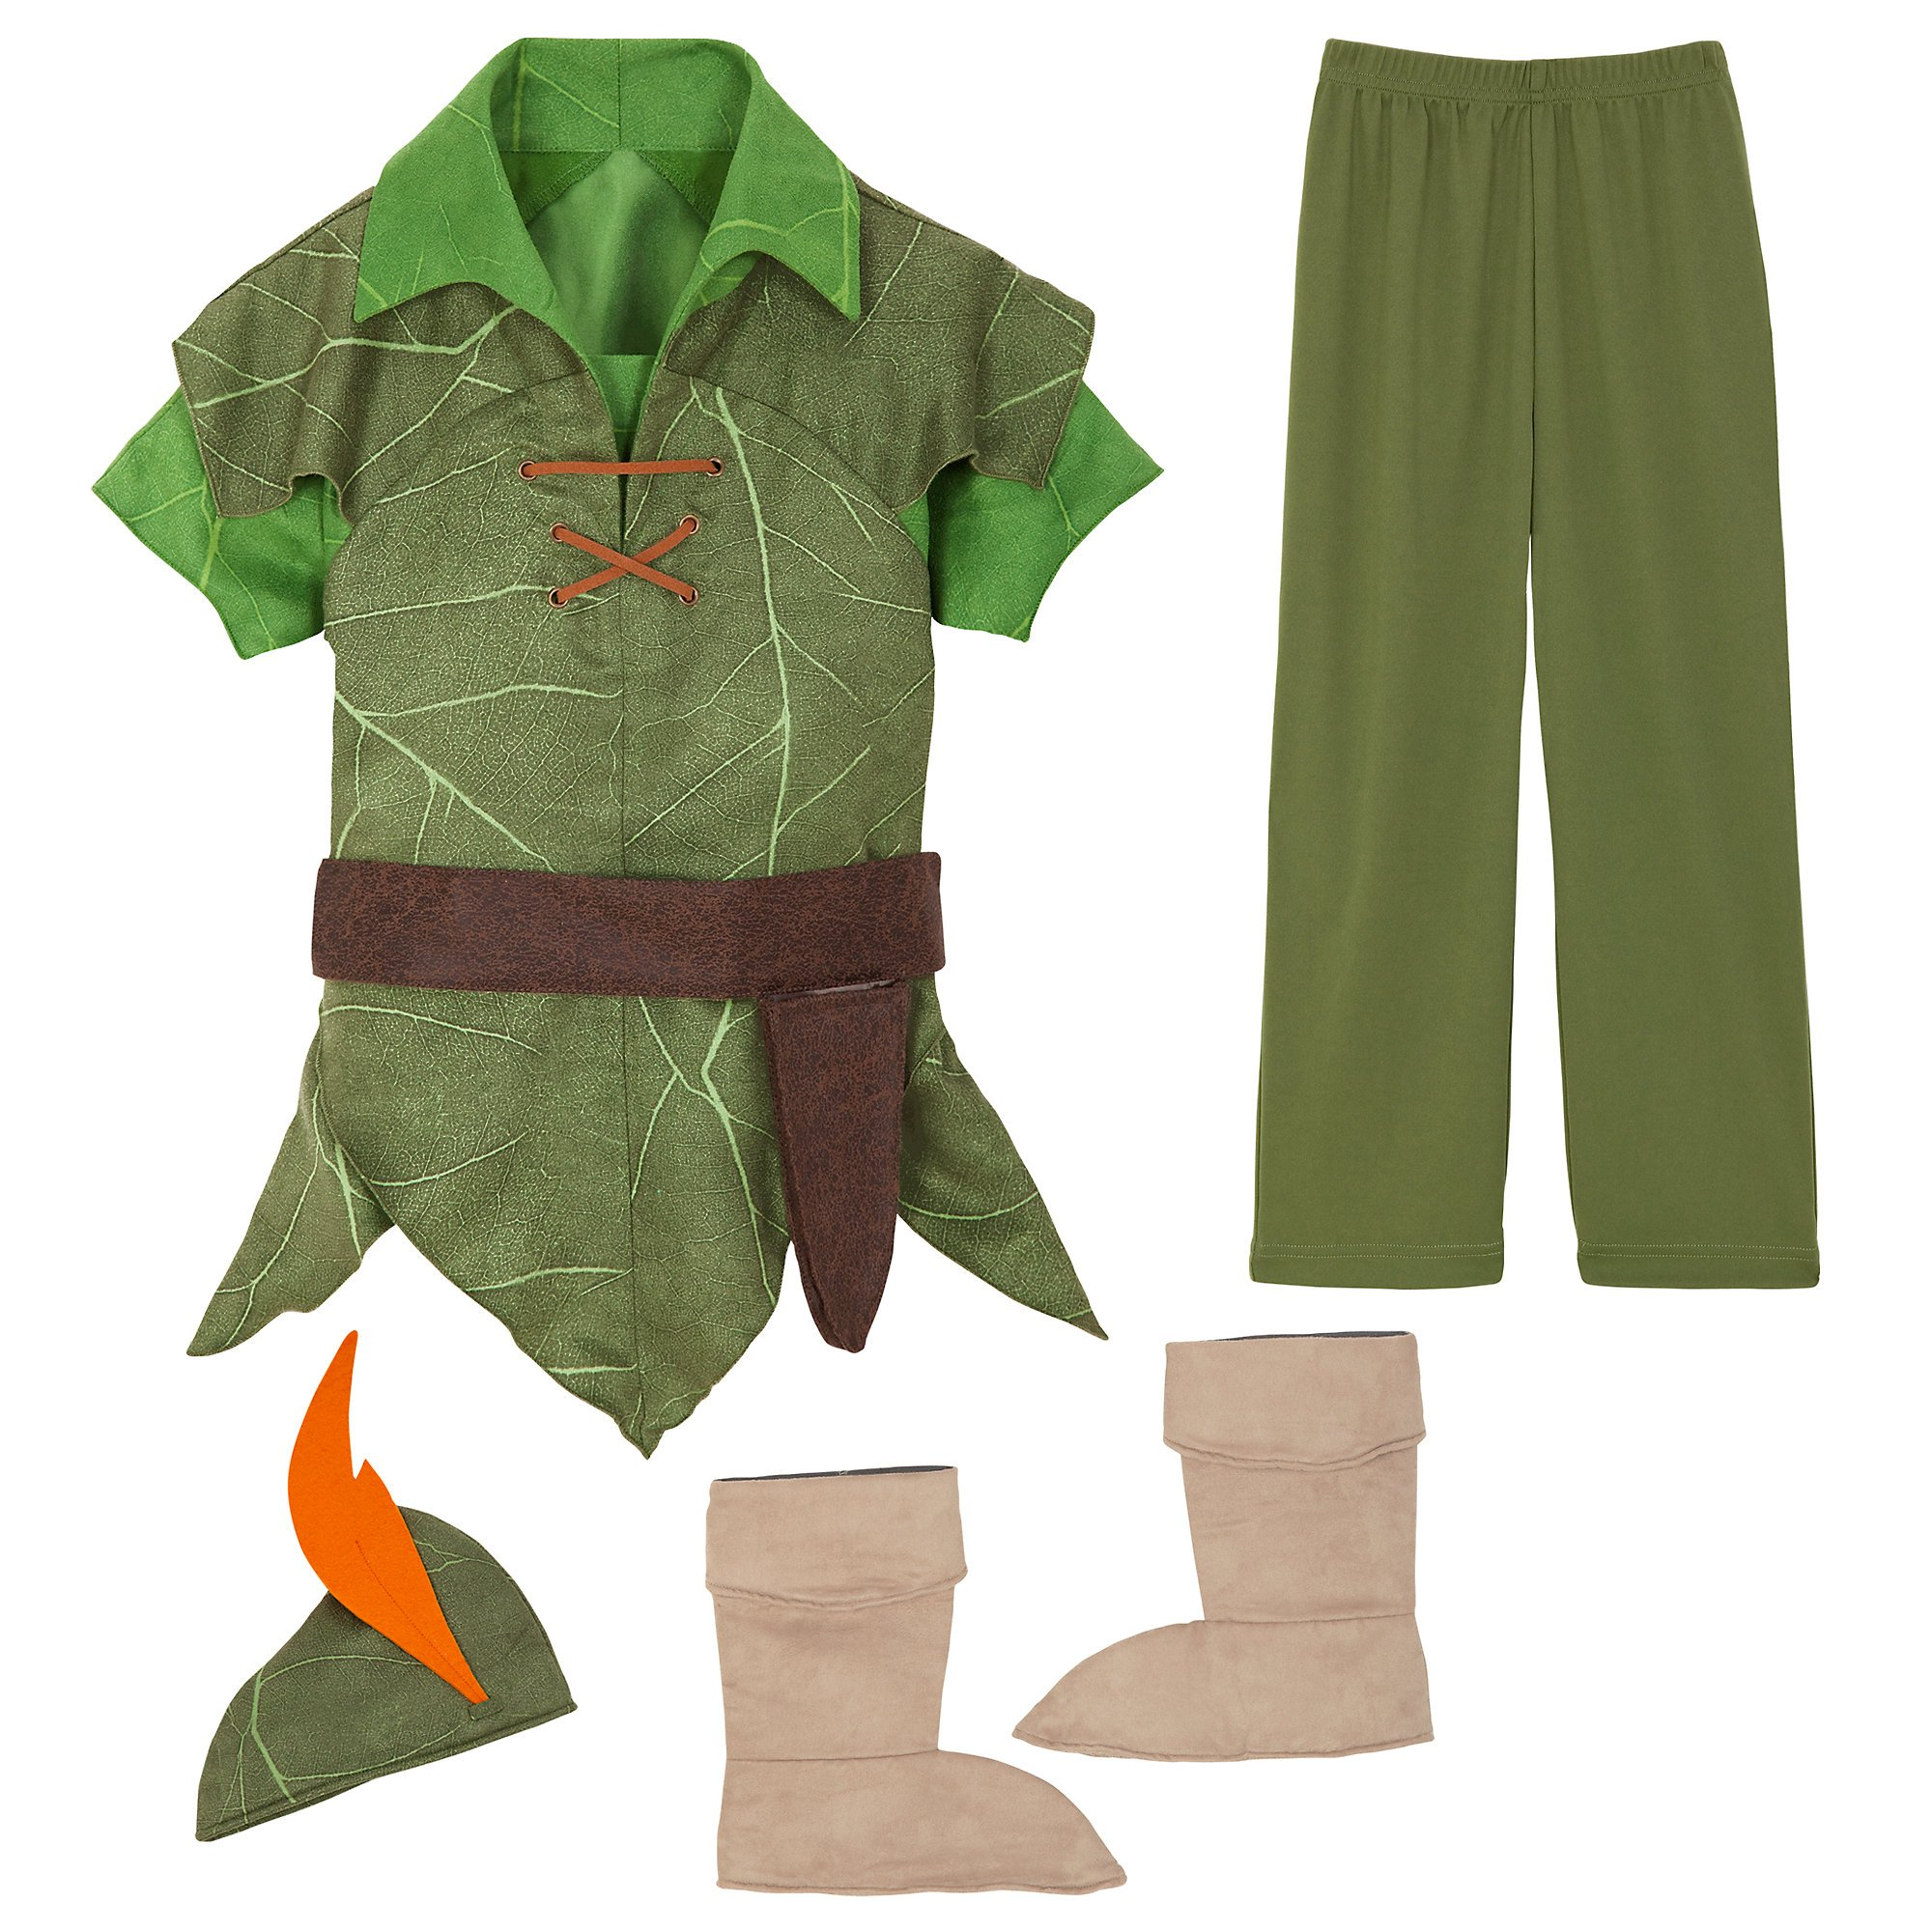 Disney Peter Pan Costume for Kids Size 5/6 Green